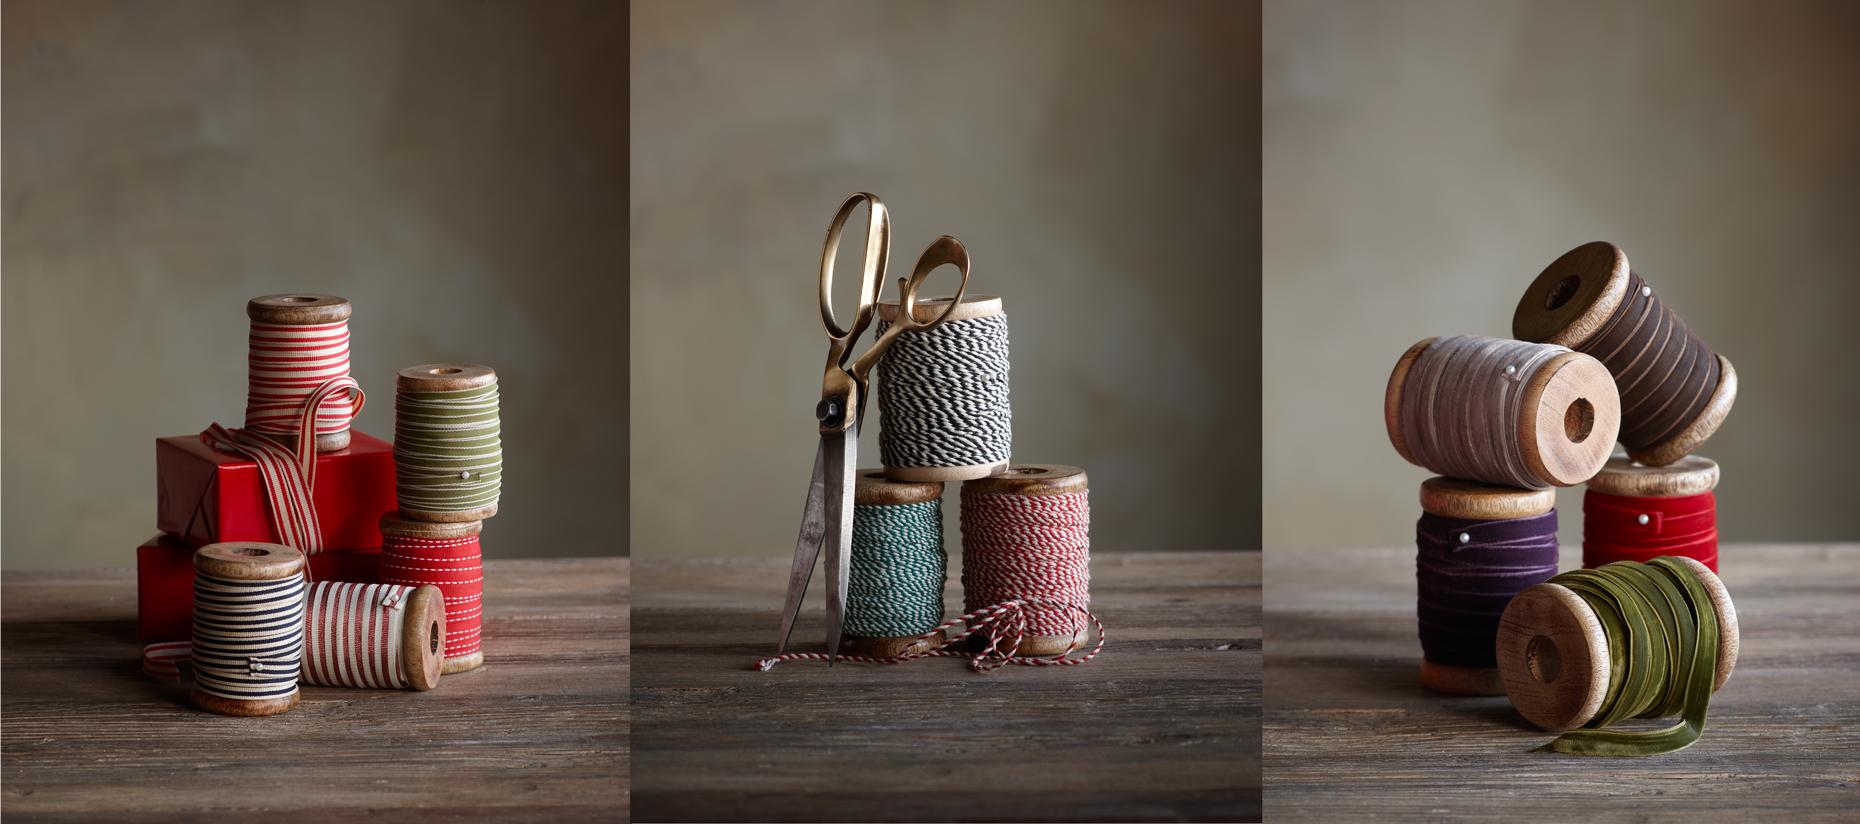 Product Photography Still Life Derek Israelsen Spools Ribbon